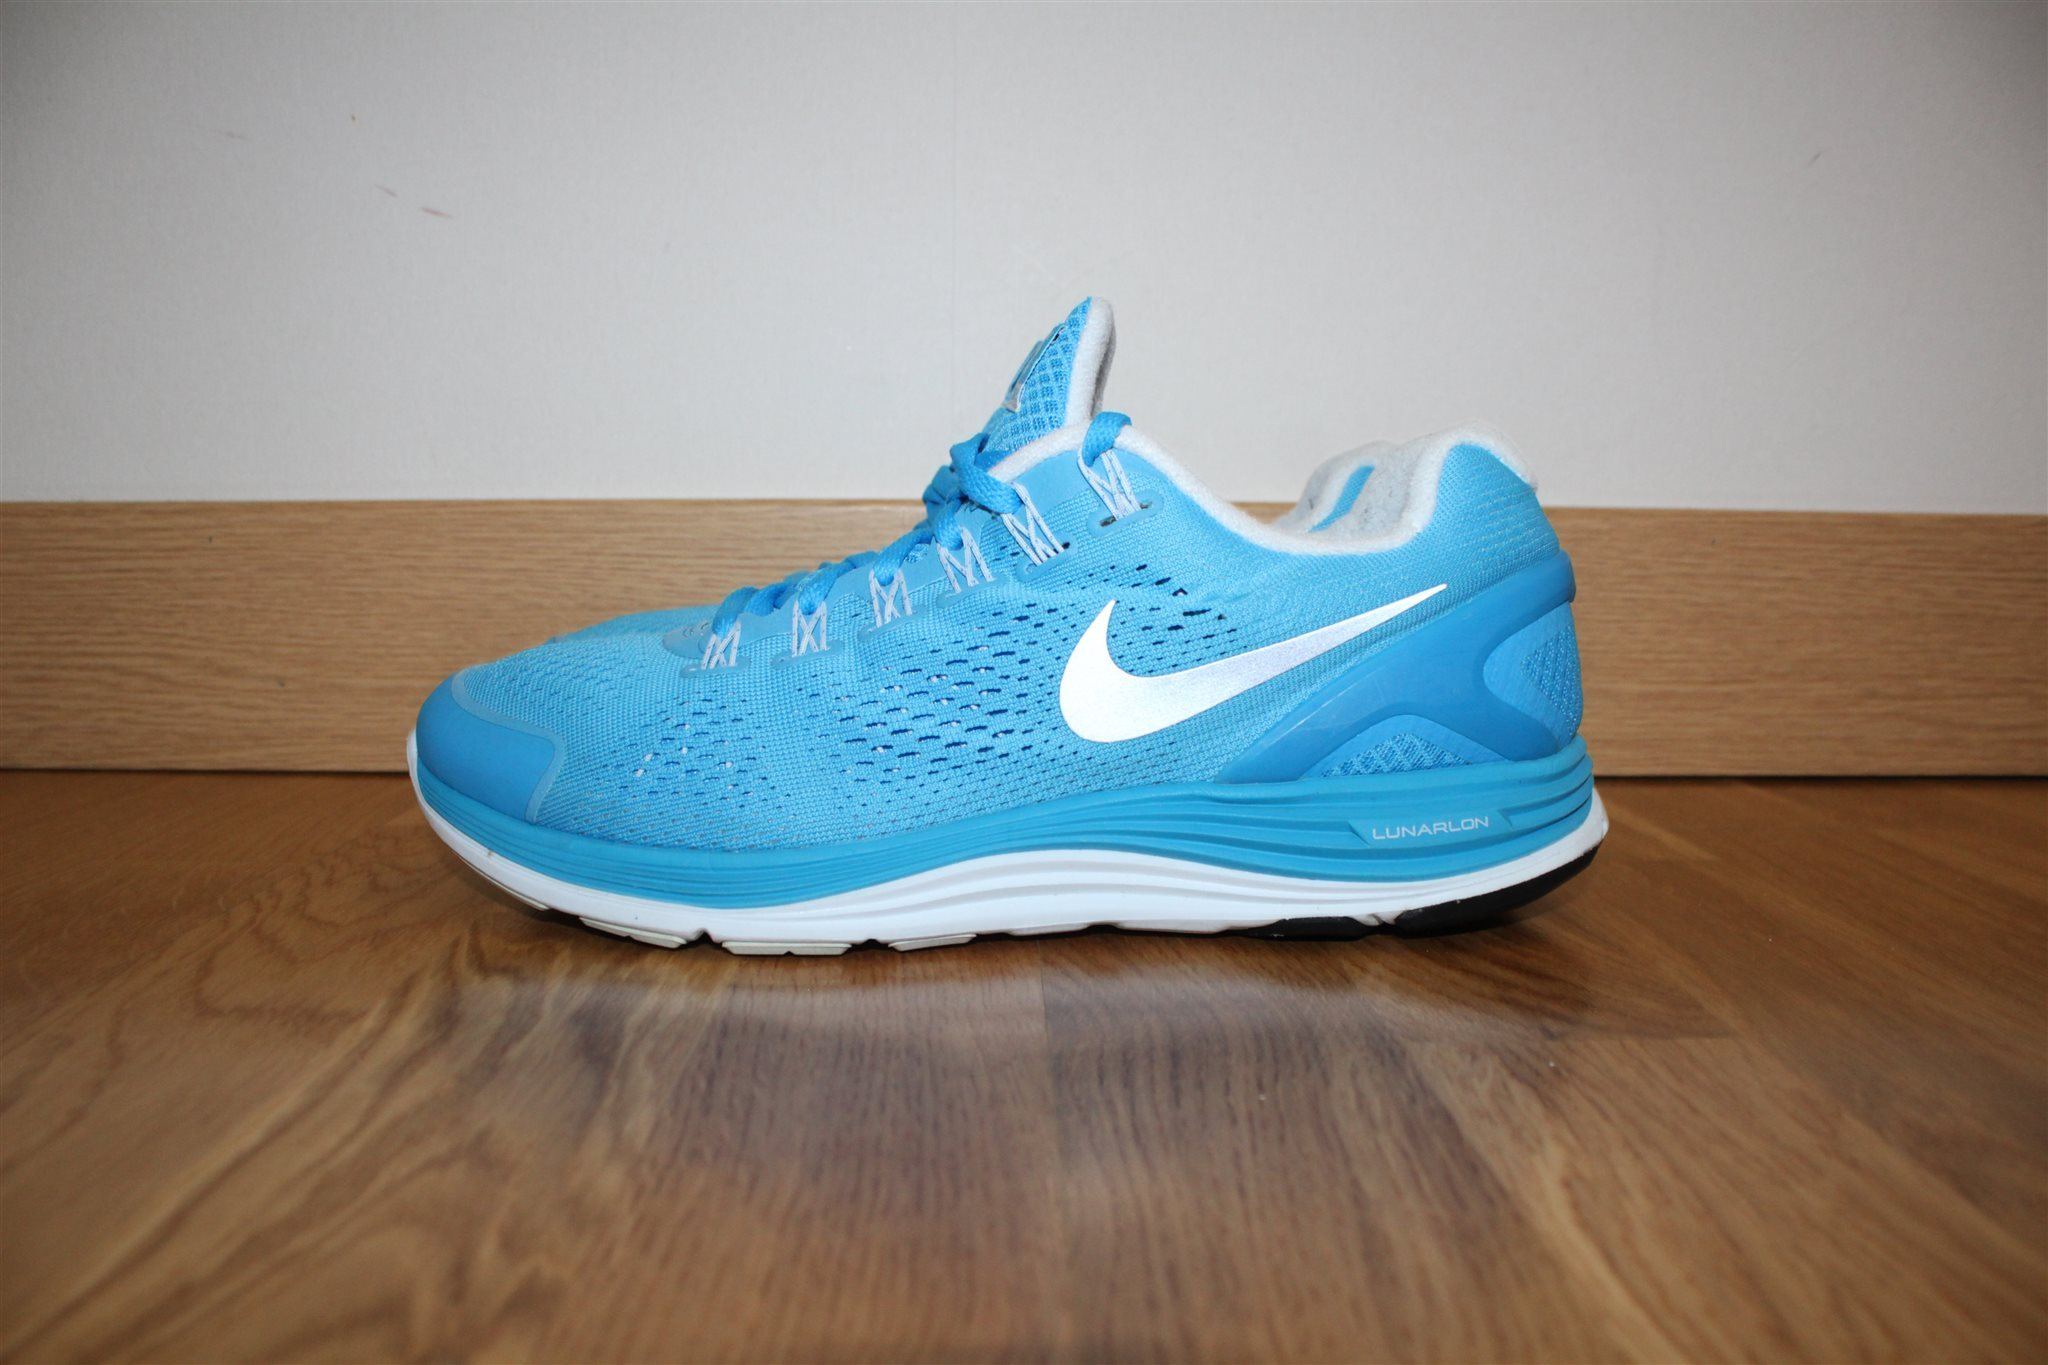 sports shoes 70025 81010 Nike Flex Supreme eb0d358 TR 3 training skor i stl 37.5. Fint skick!